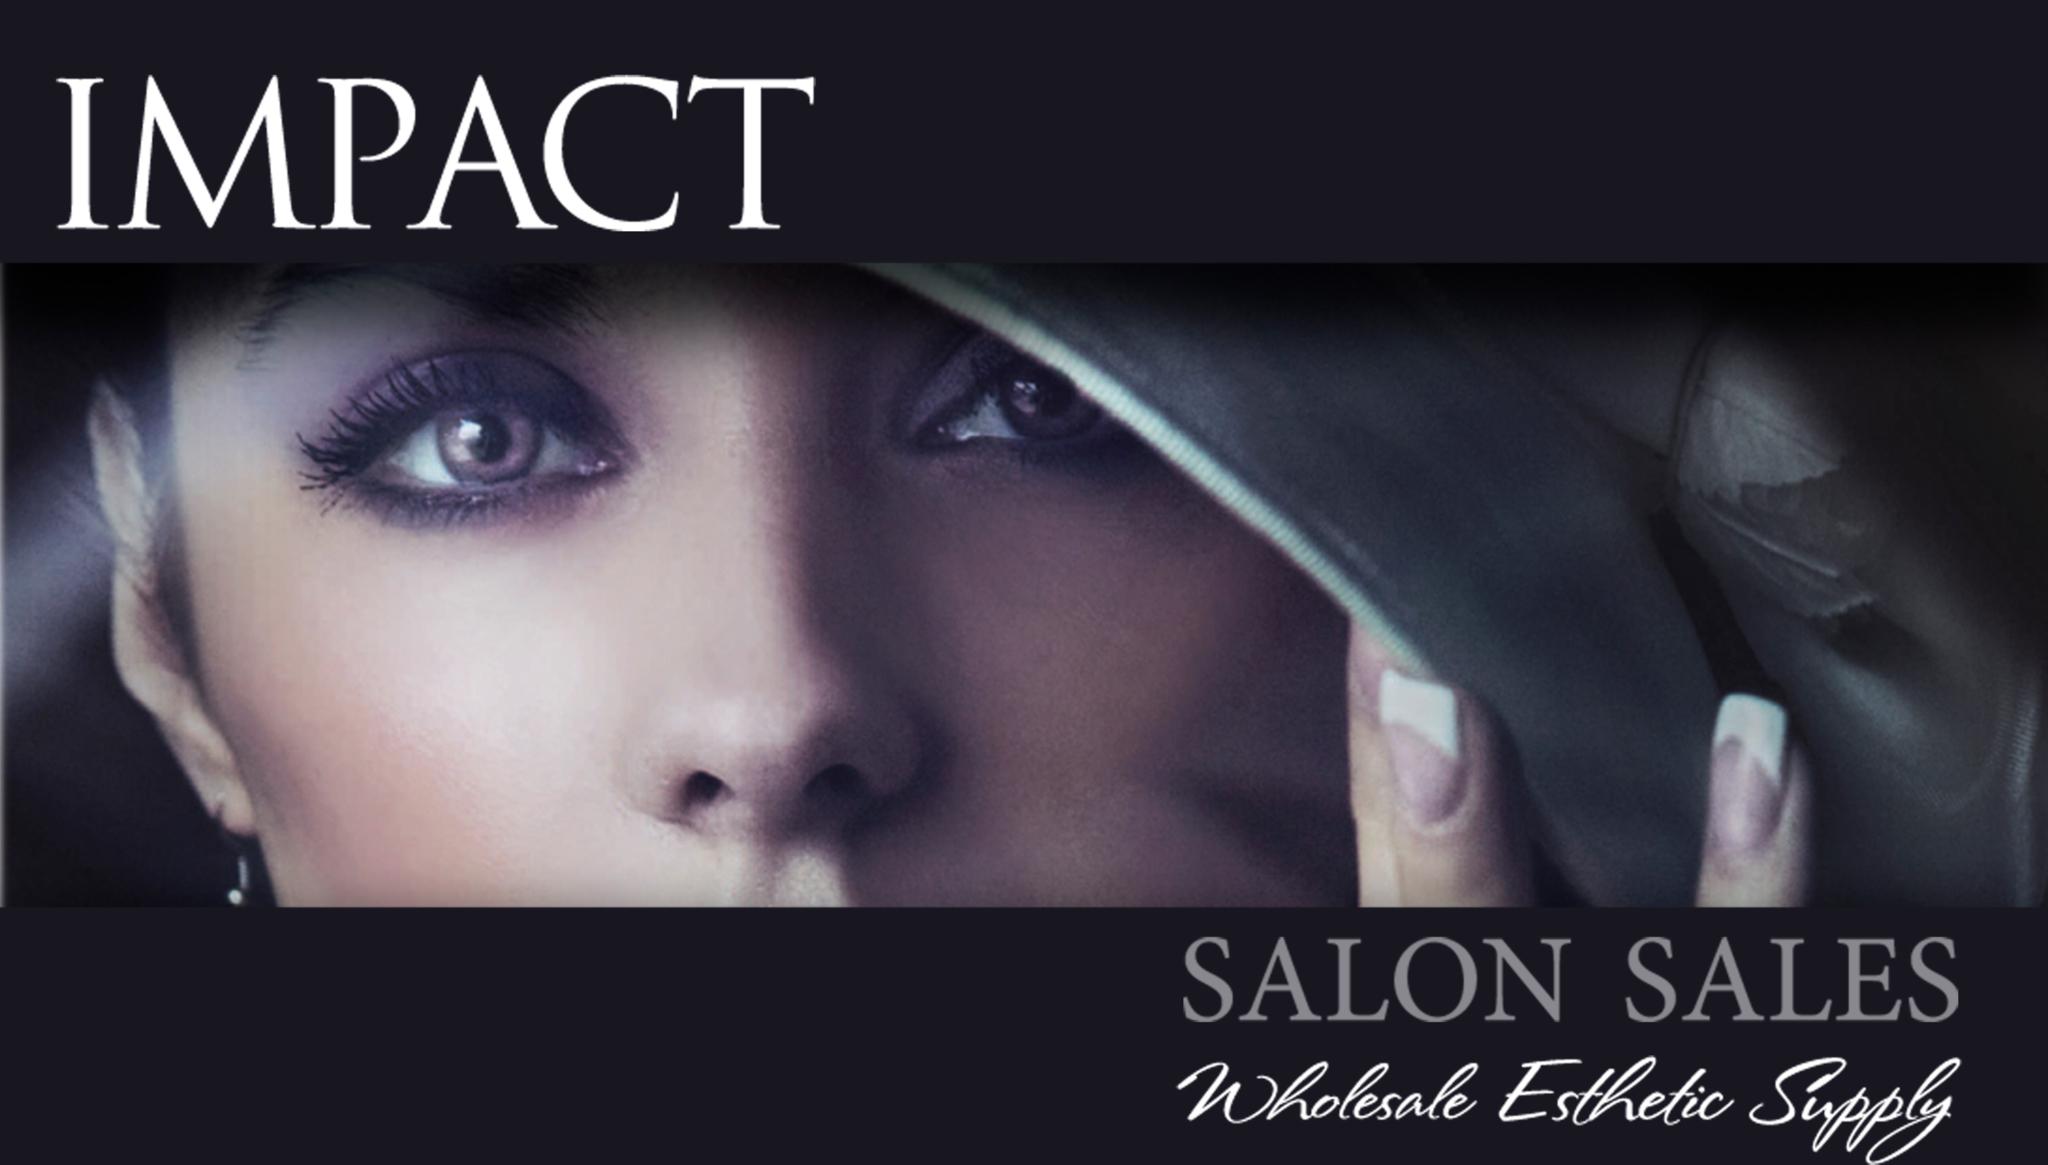 Impact Salon Sales Inc